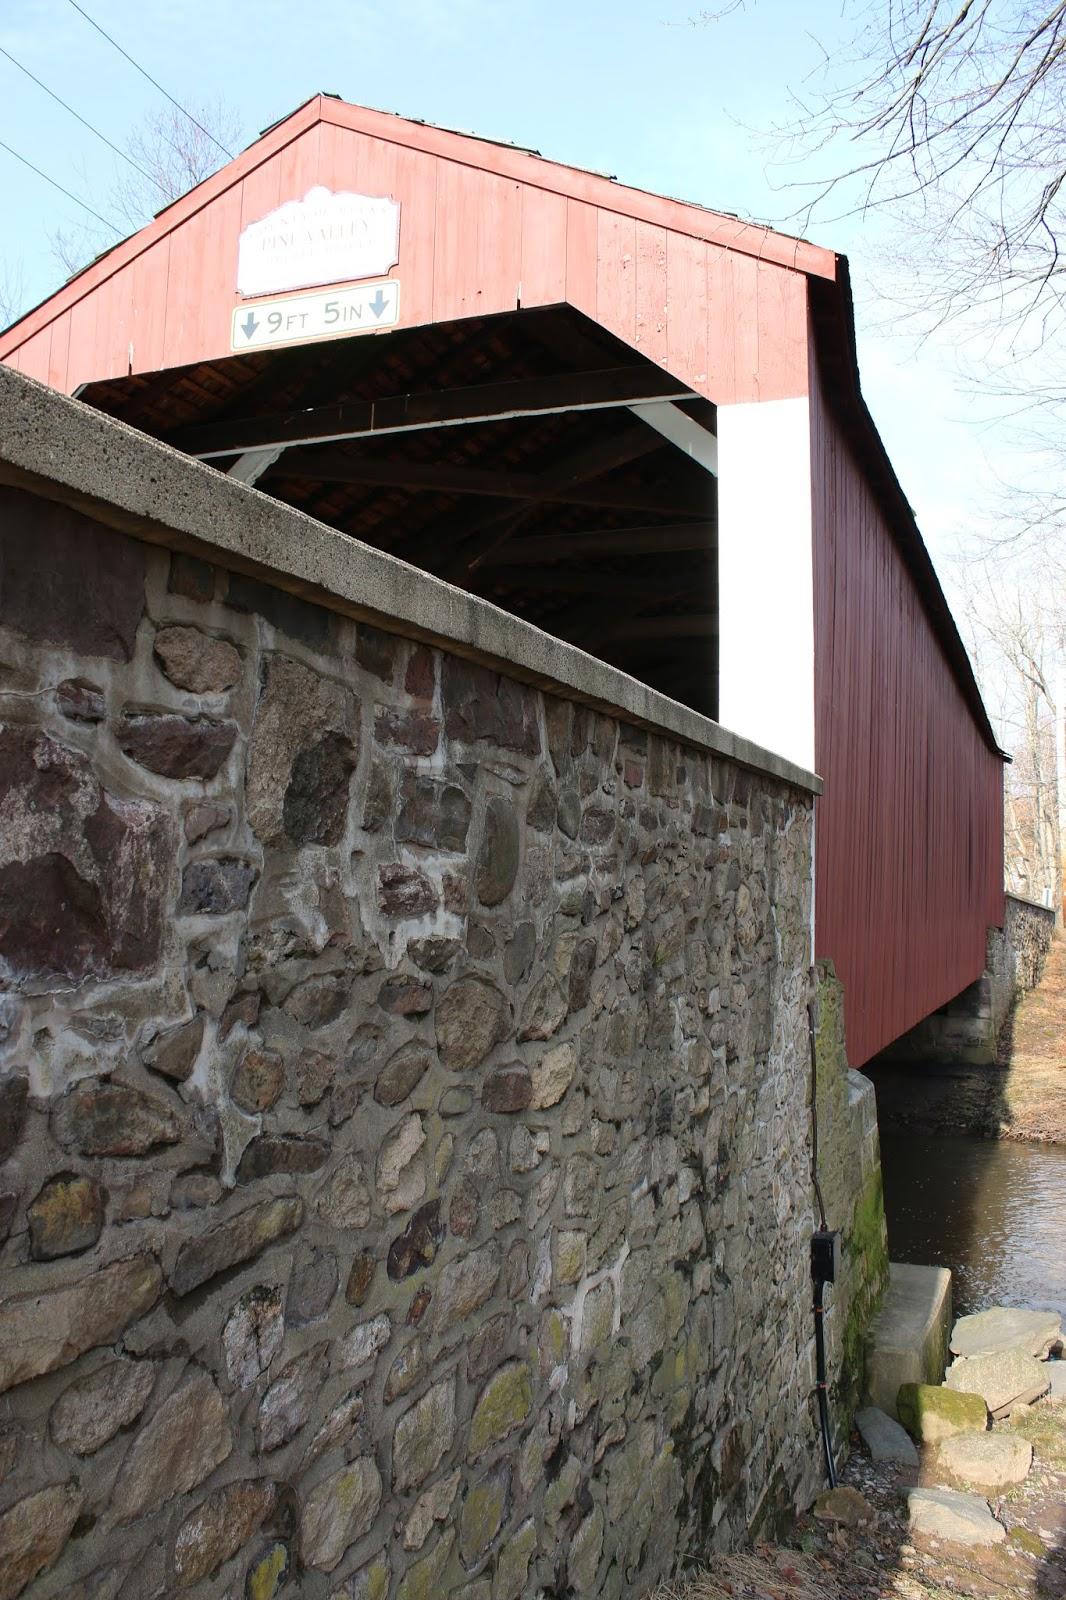 Pine Valley Covered Bridge: Near Doylestown, Bucks County ...